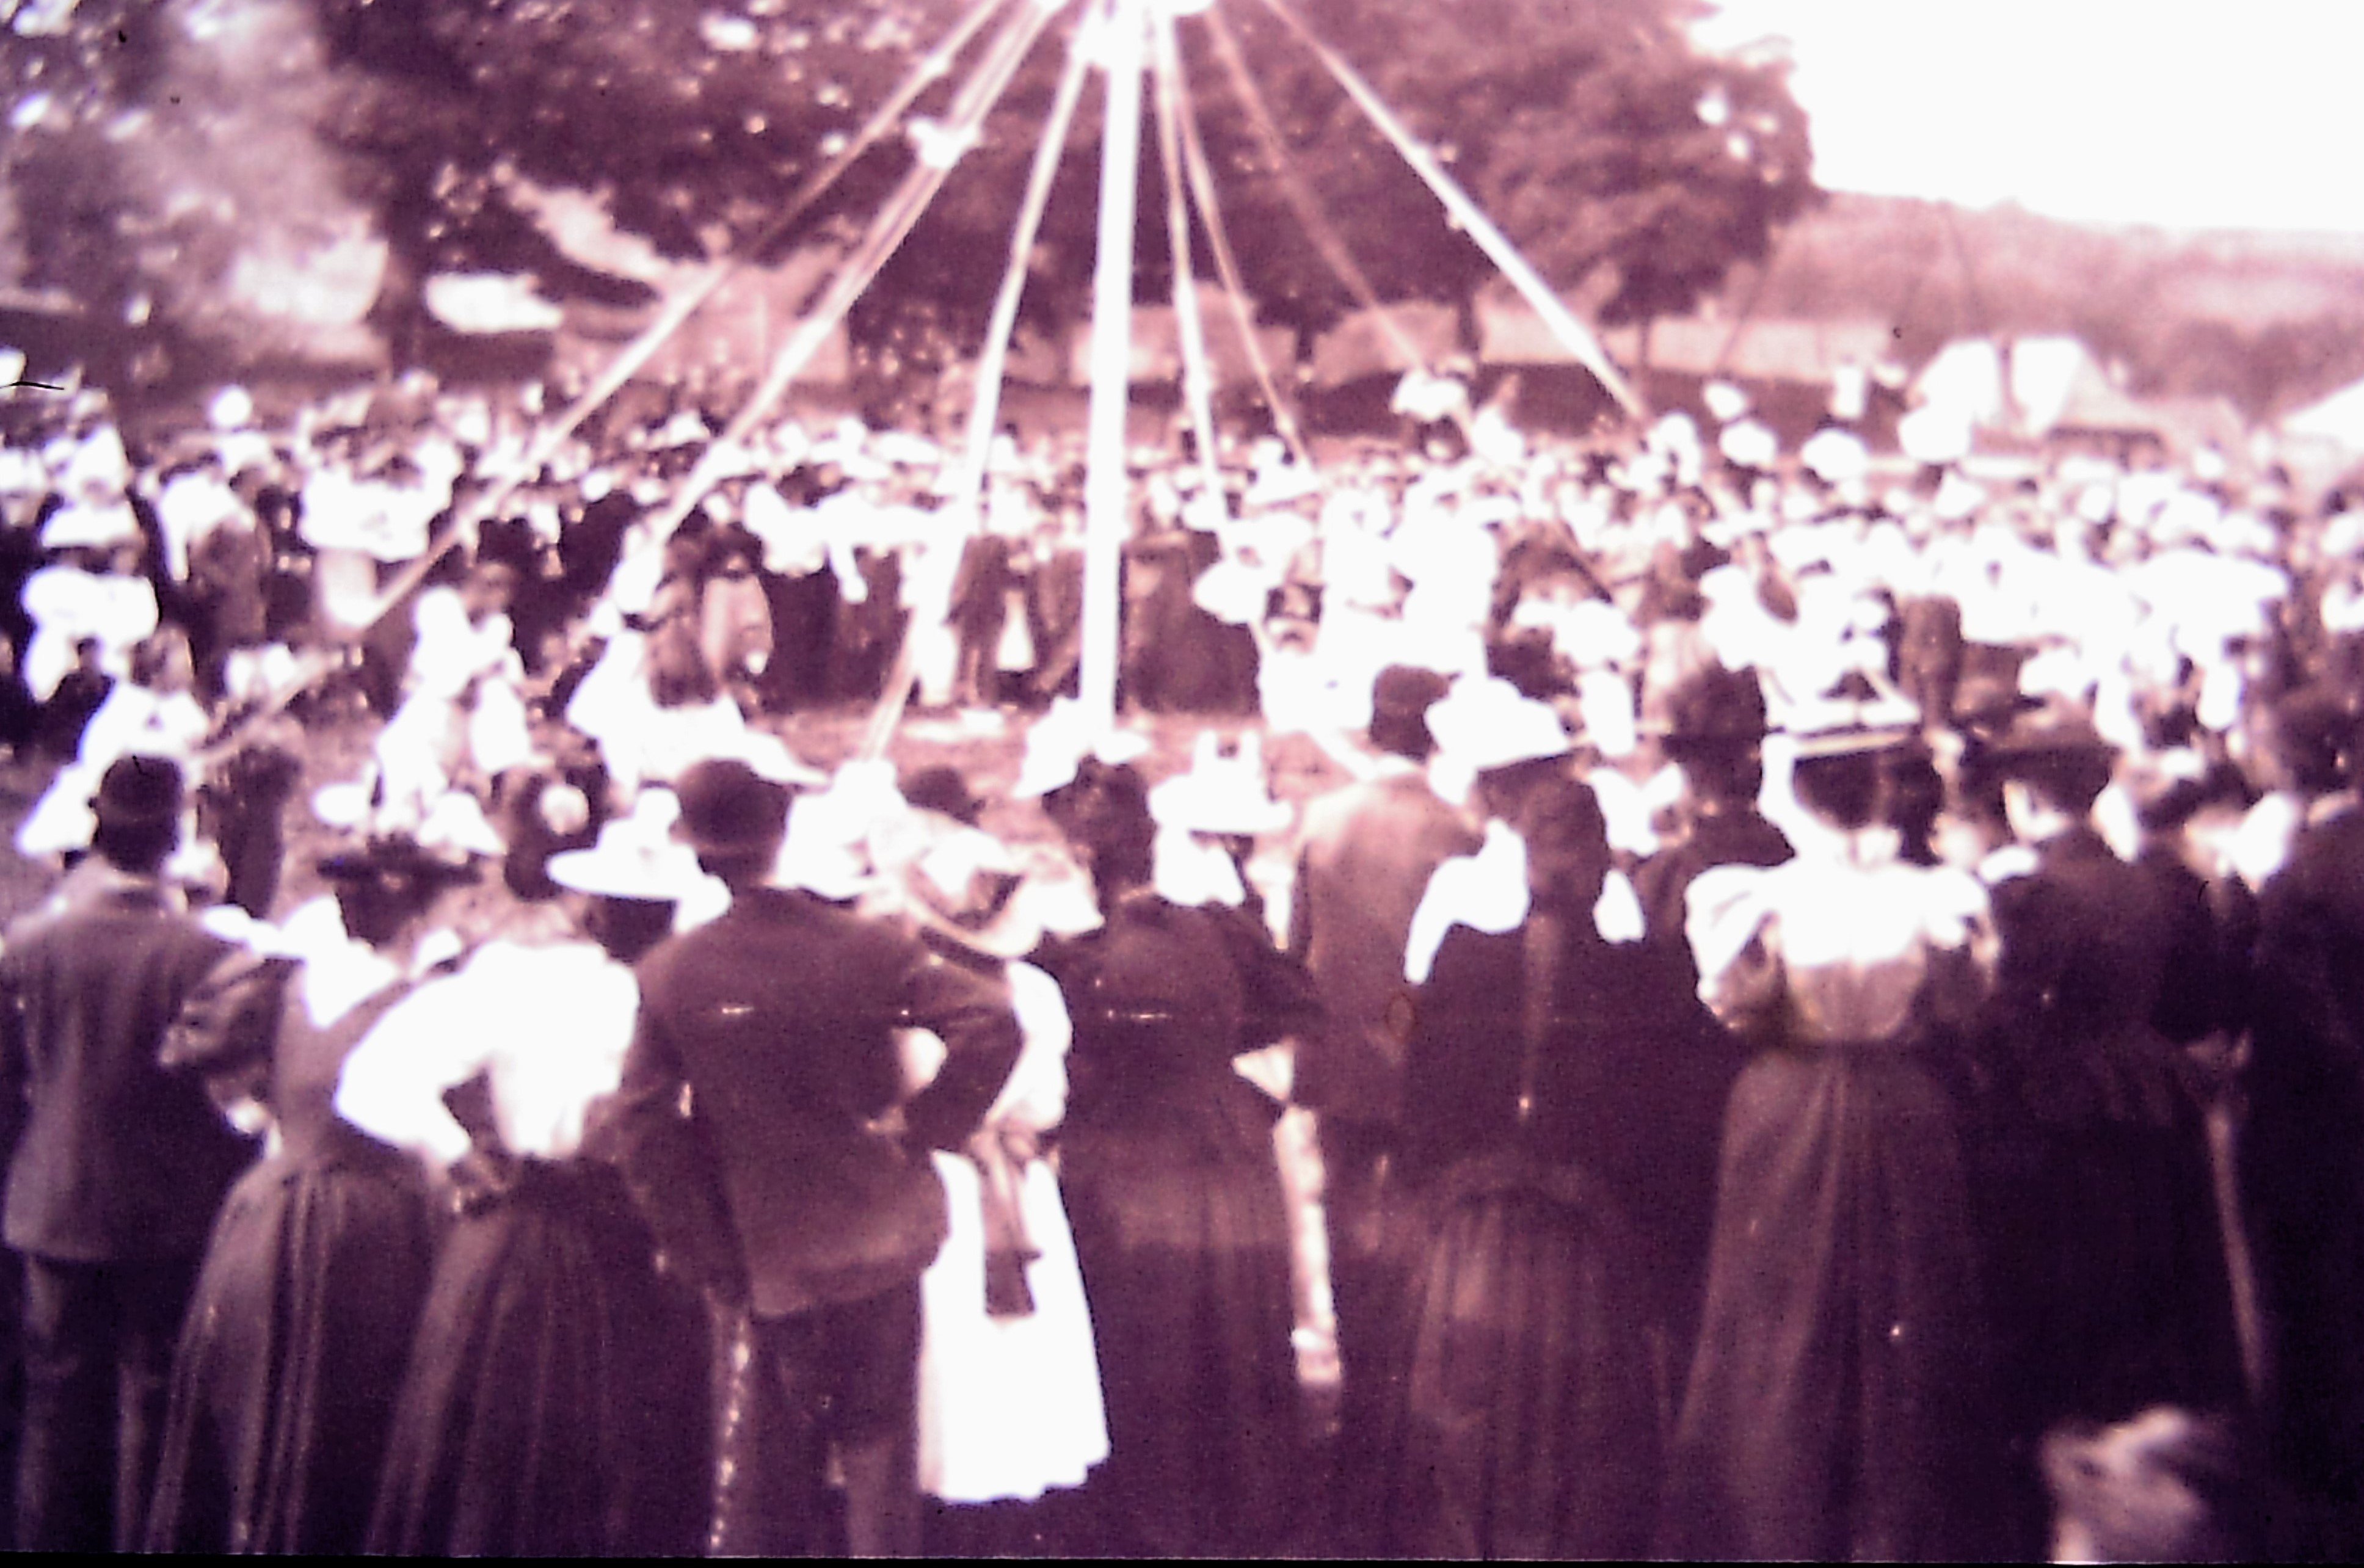 Plympton St Maurice maypole dancers - 1908